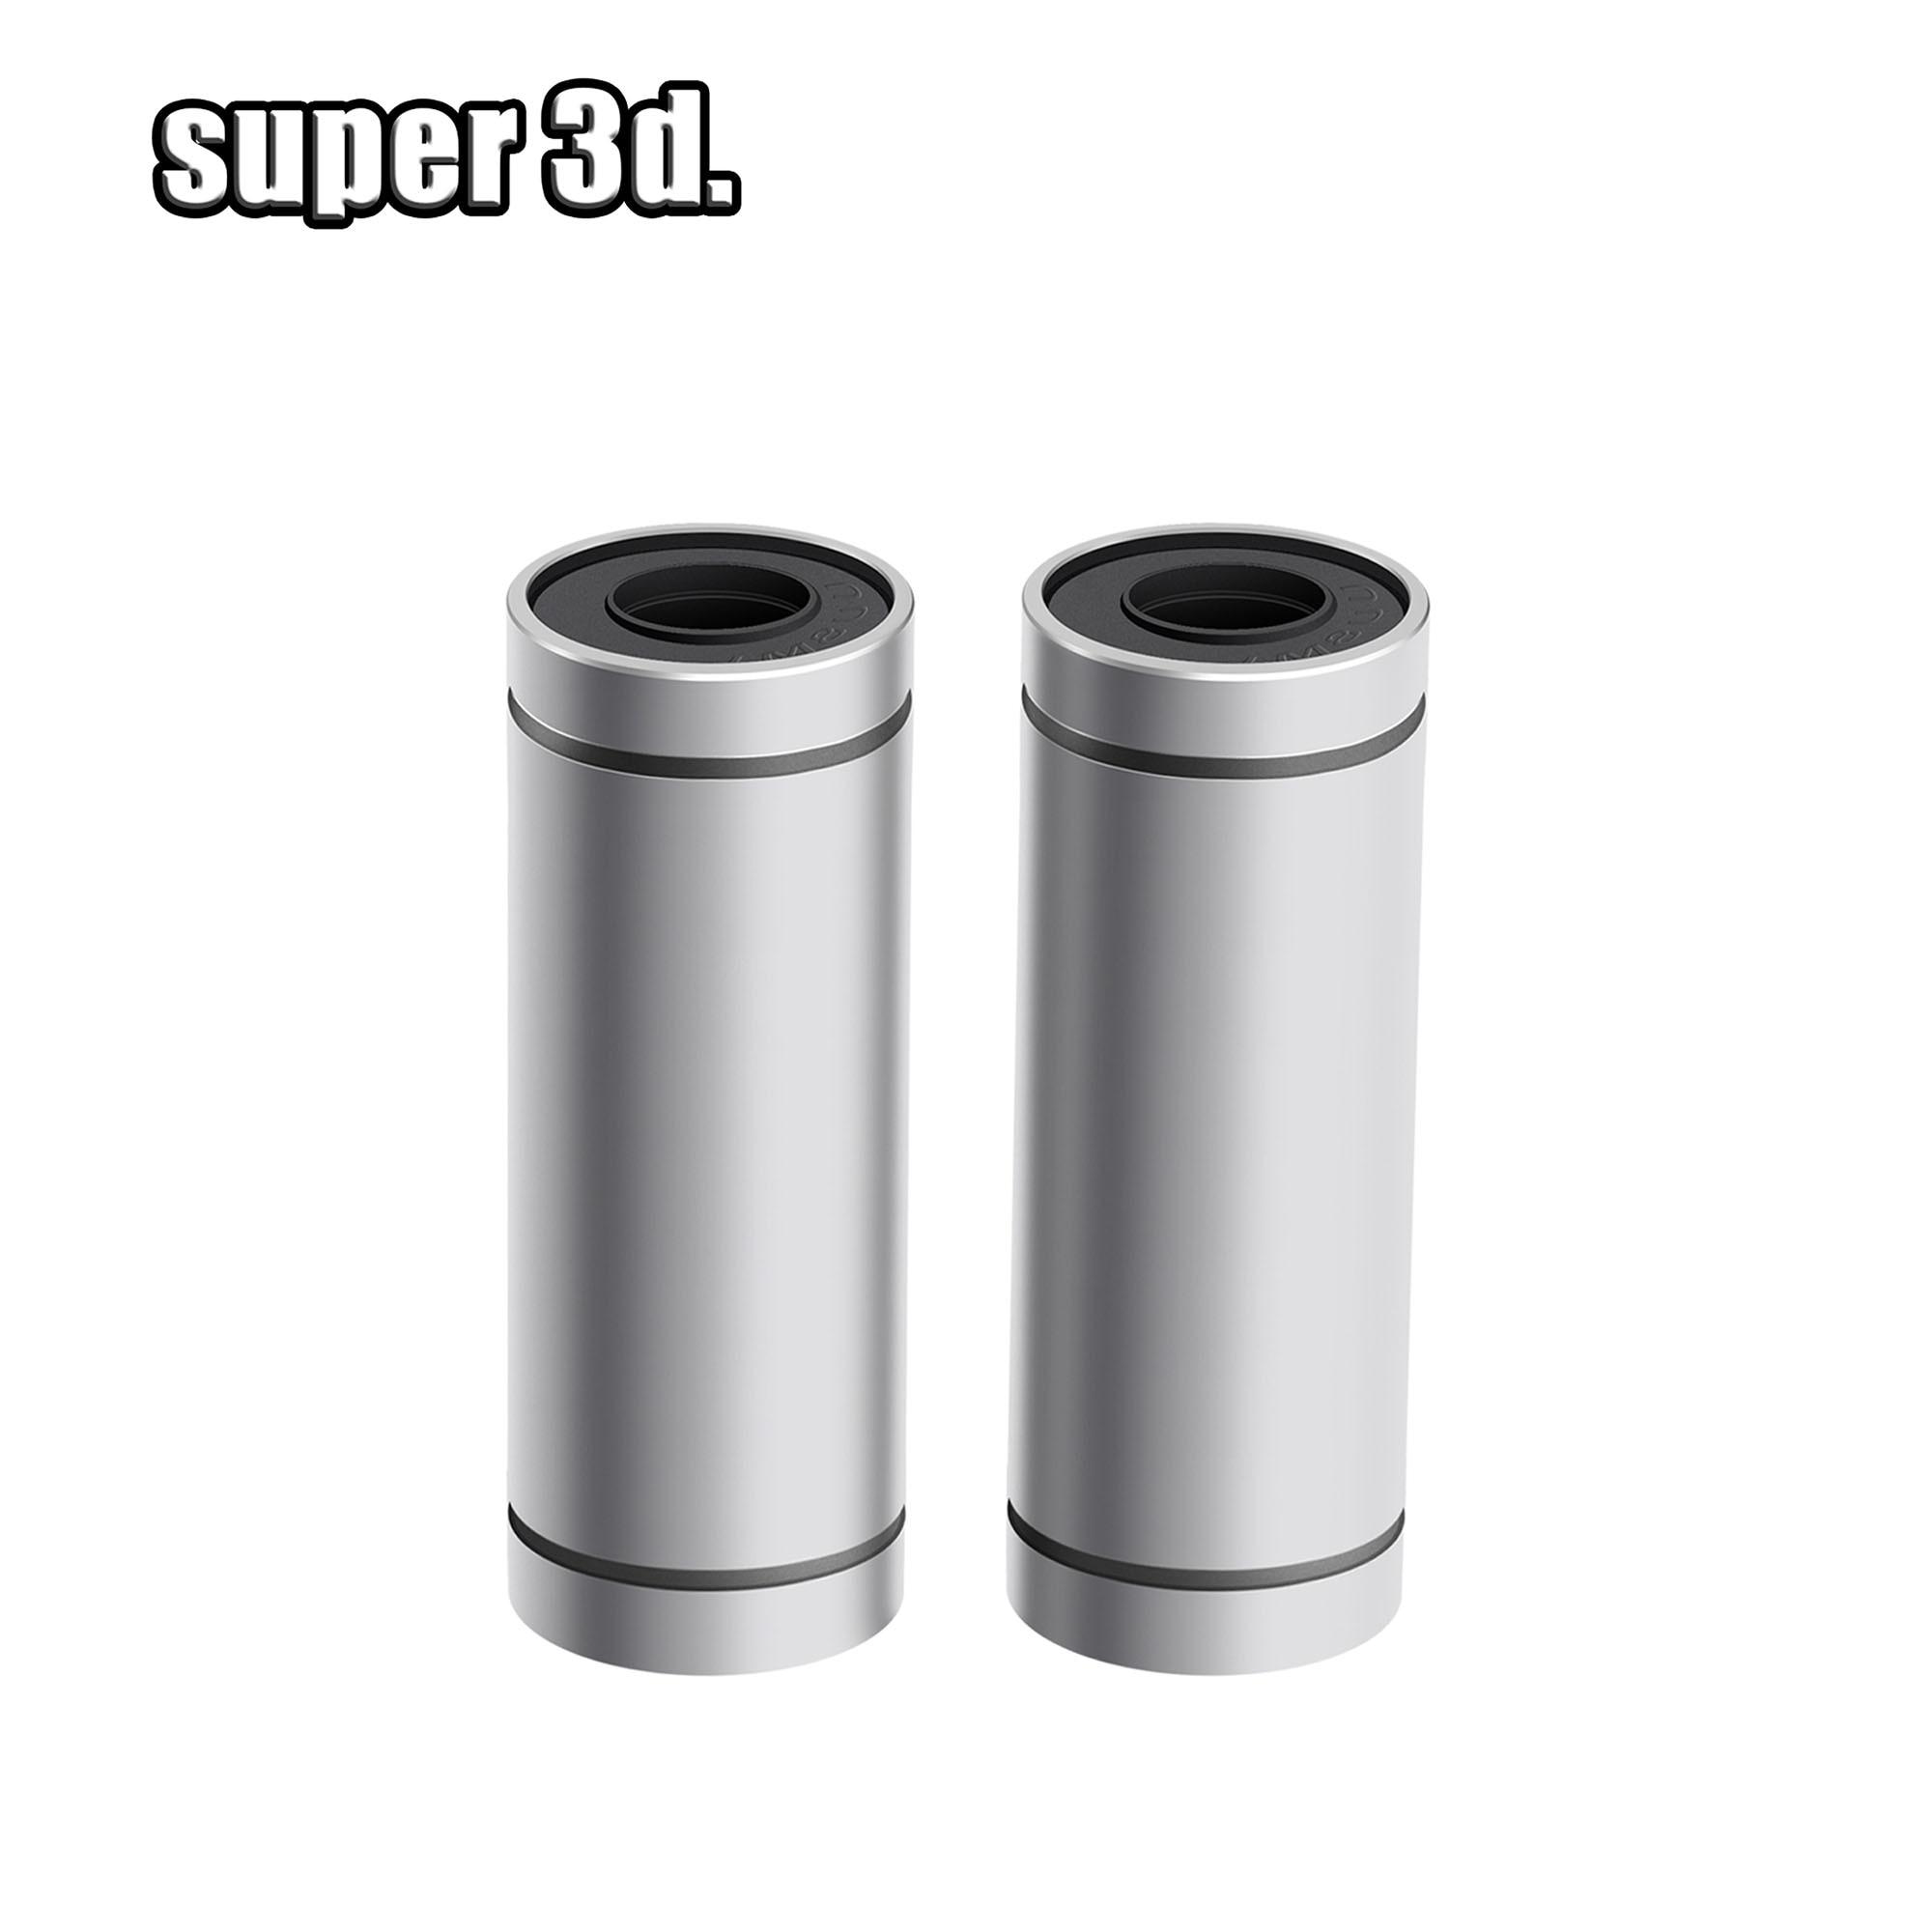 6mm Bearing//Bushing LM6LUU Linear Motion